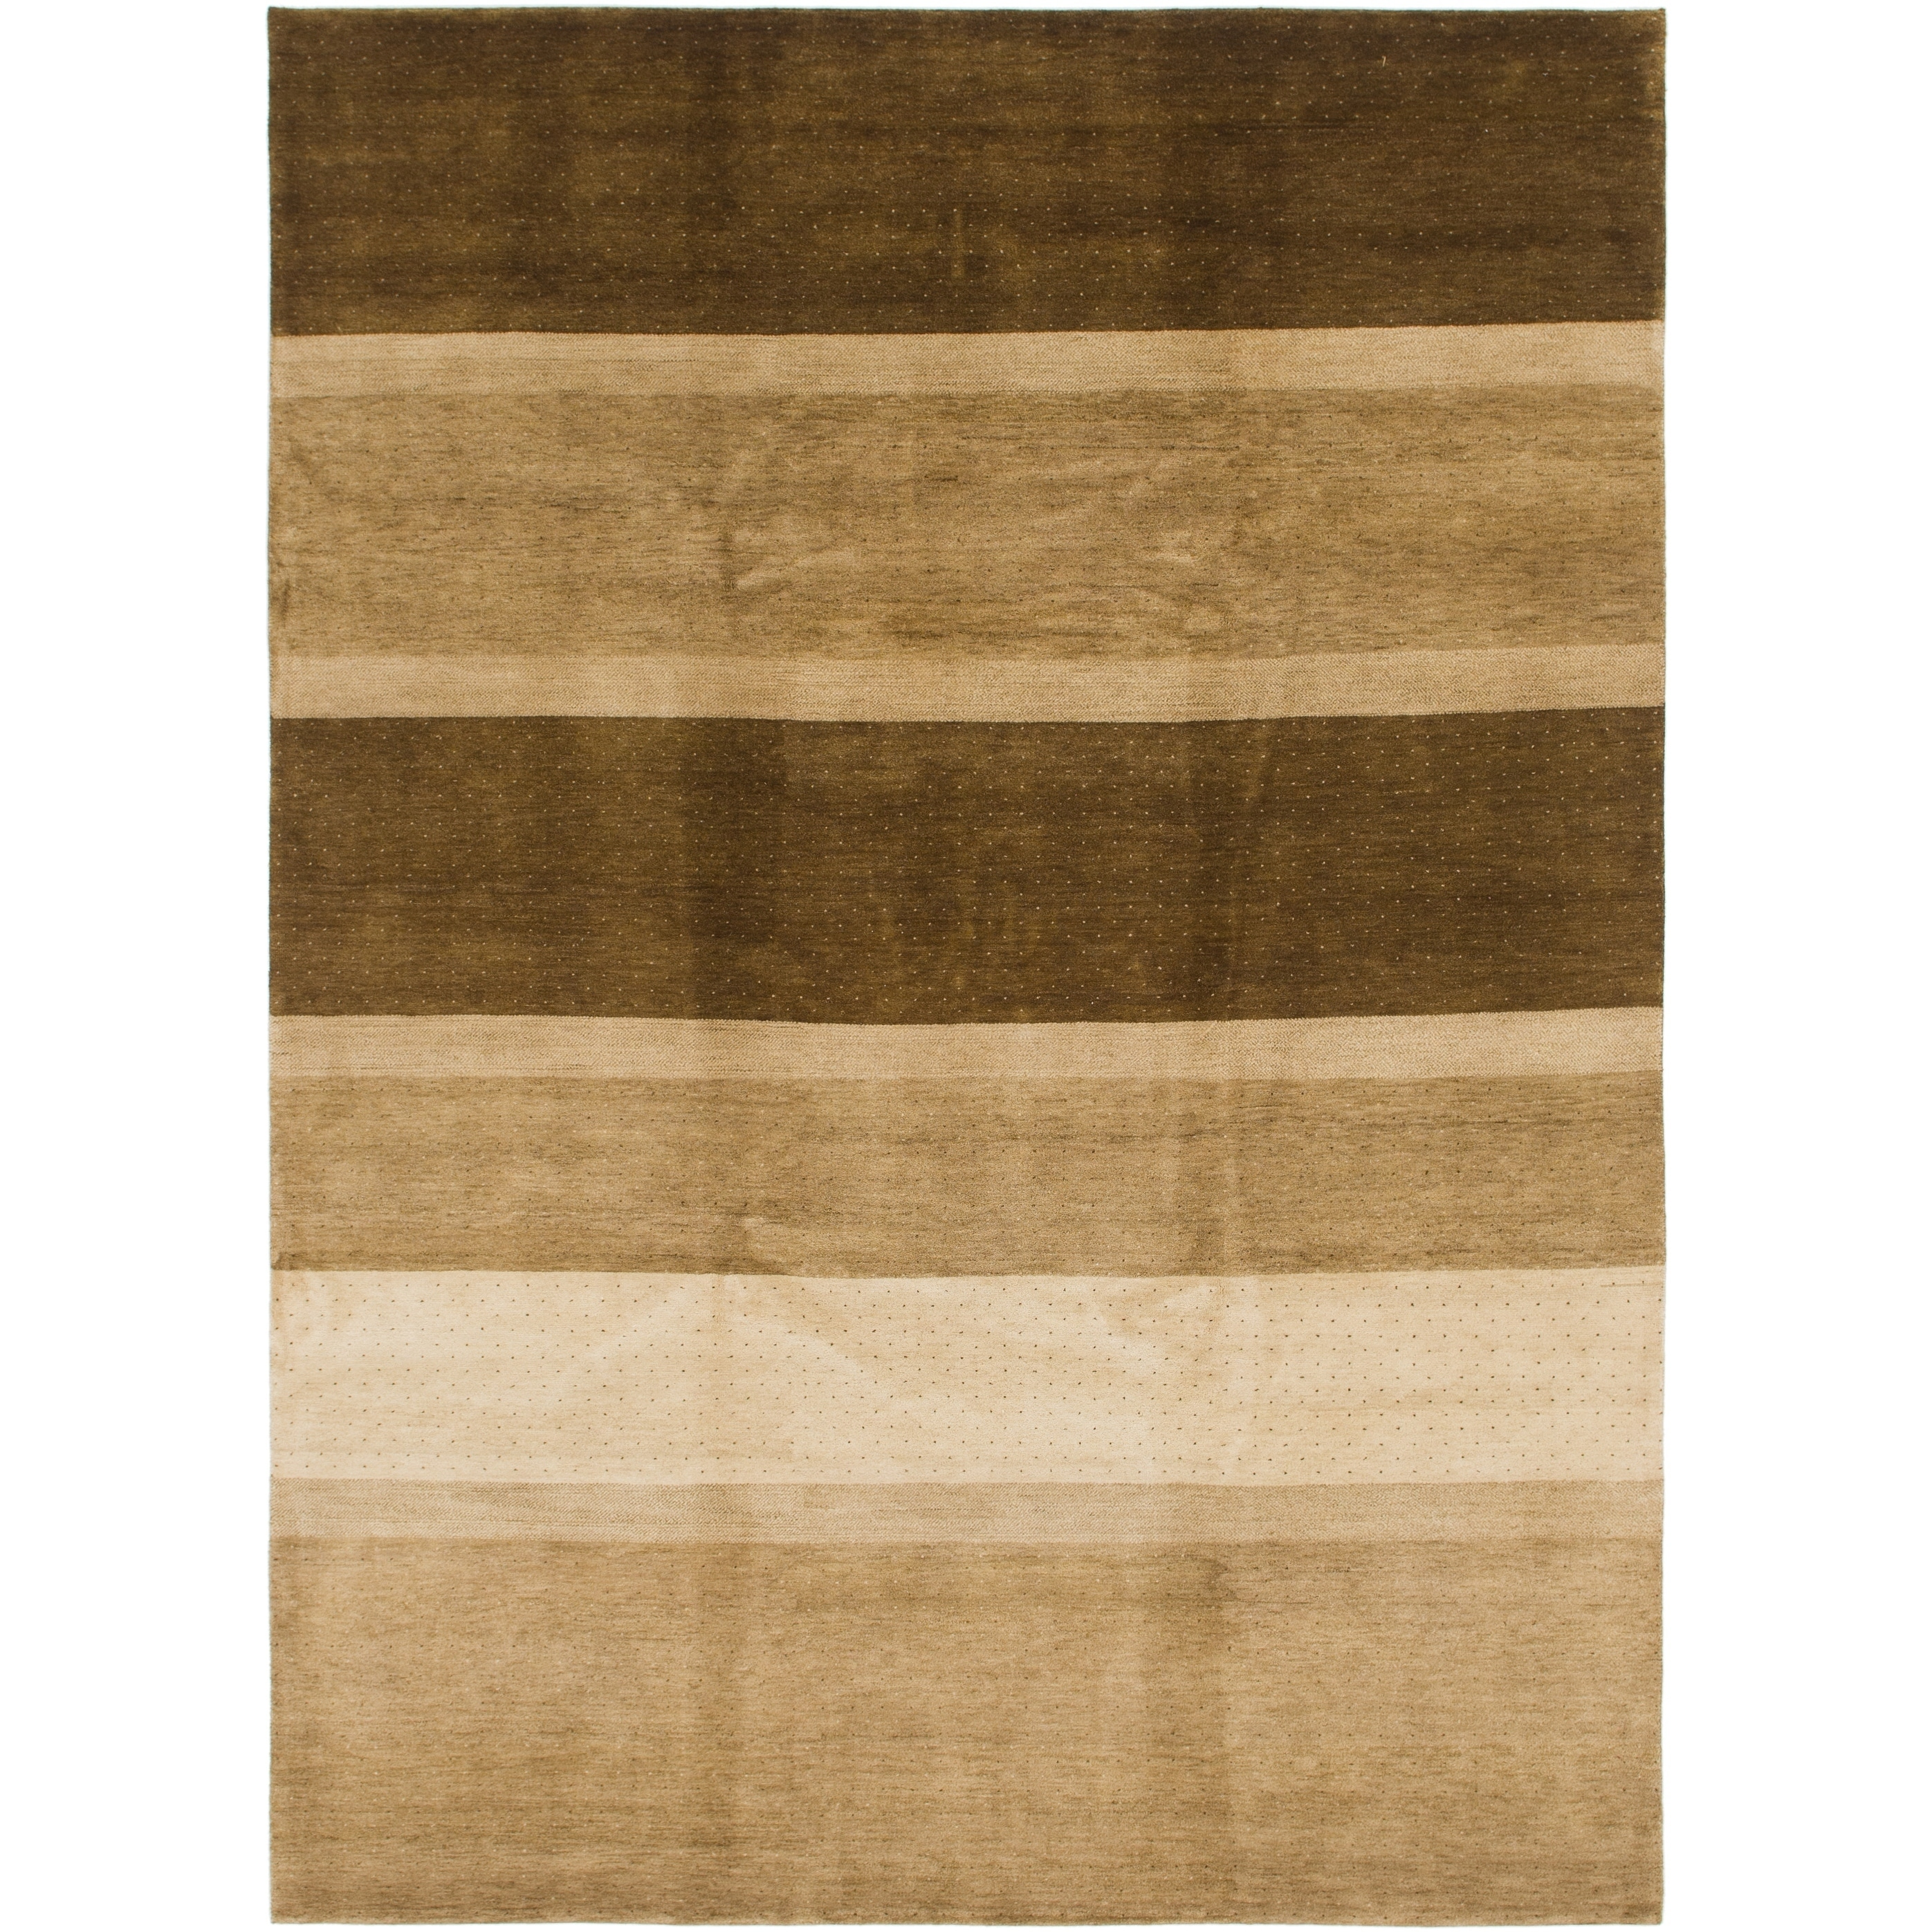 Hand Knotted Kashkuli Gabbeh Wool Area Rug - 8 2 x 11 3 (Beige - 8 2 x 11 3)